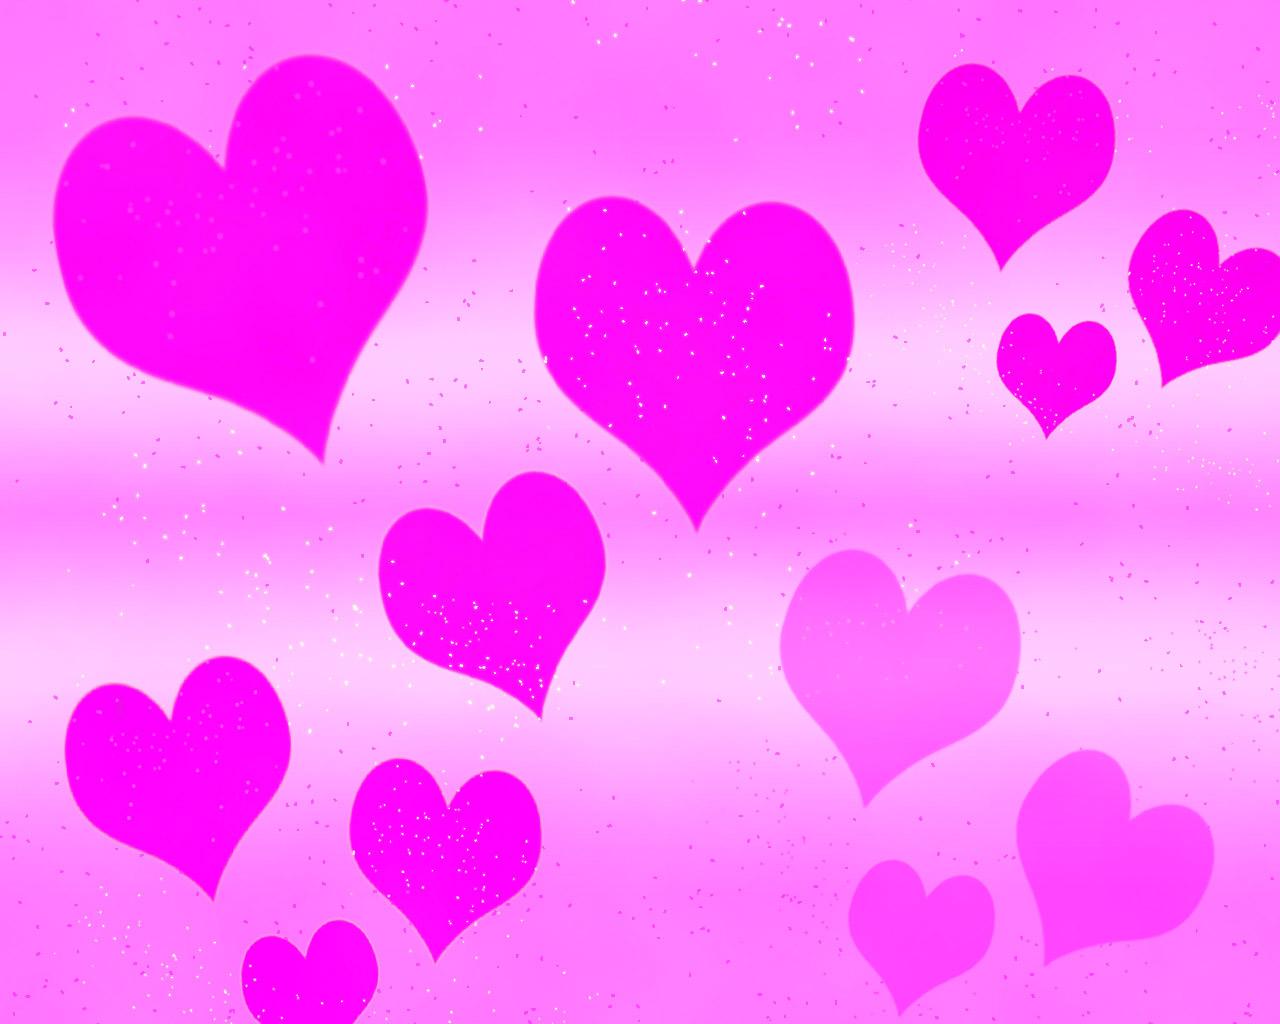 http://3.bp.blogspot.com/-NQD7K4Y8tEk/TkpQWFvm-VI/AAAAAAAAAnE/kcmtQCBZVQ4/s1600/Cute_party_hearts.jpg